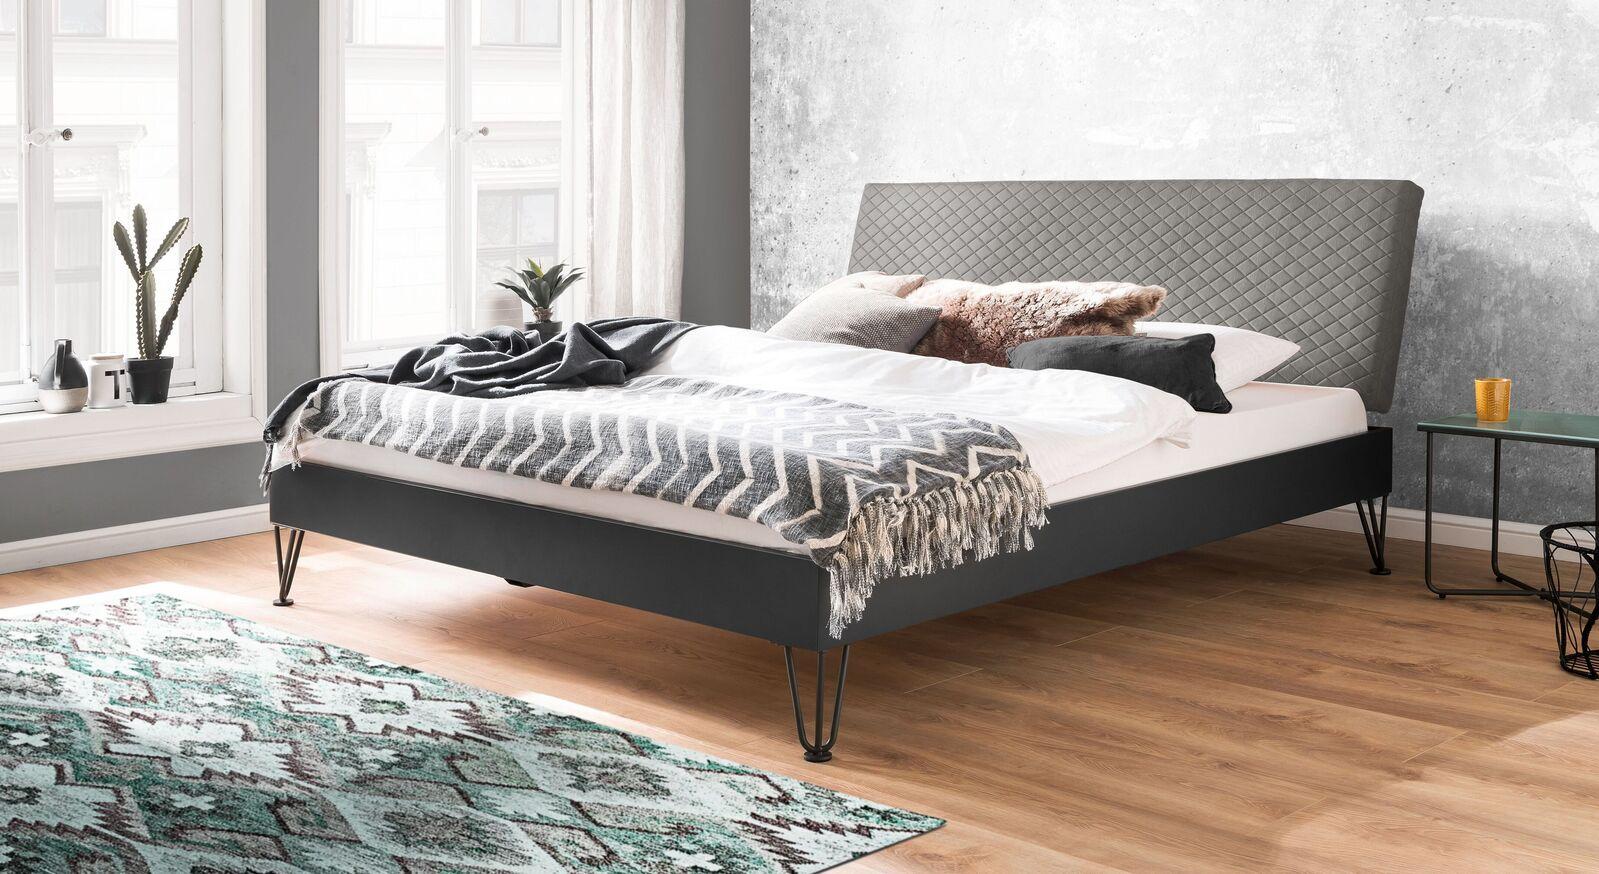 Preiswertes Bett Vegeta in angesagtem Materialmix